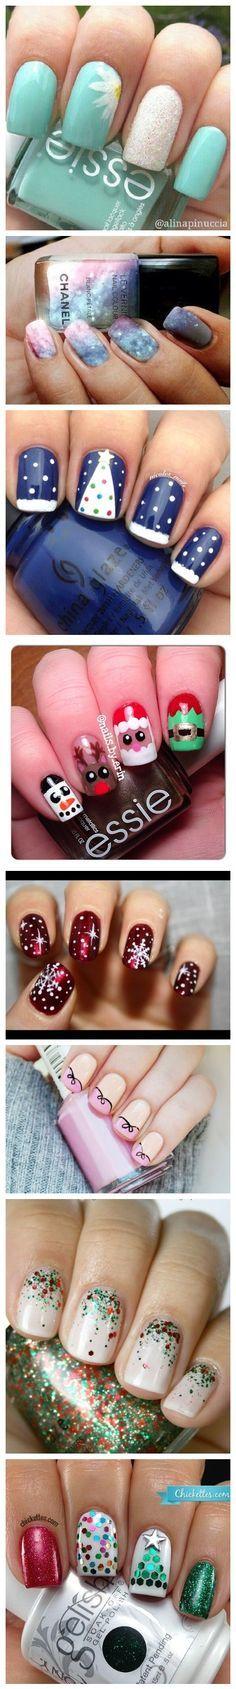 Image Most Cute Christmas Nail Art Designs Cute Nail Art, Nail Art Diy, Easy Nail Art, Diy Nails, Xmas Nails, Holiday Nails, Fingernail Designs, Nail Art Designs, Fancy Nails